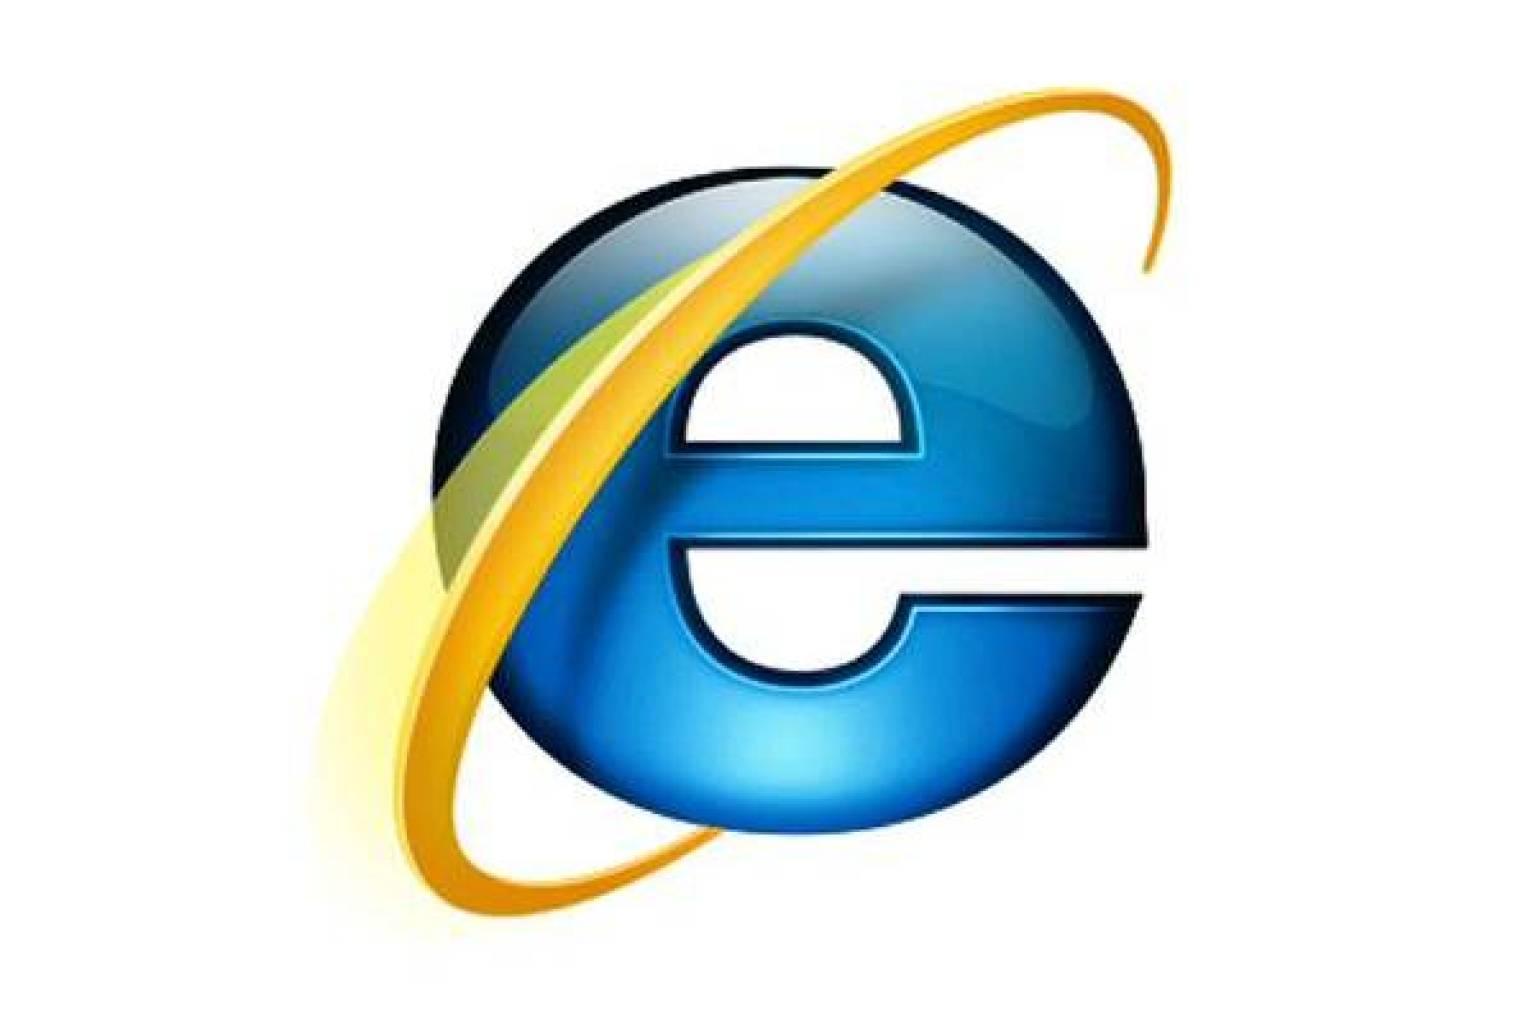 Windows  screensaver  change  set  customize  preferences